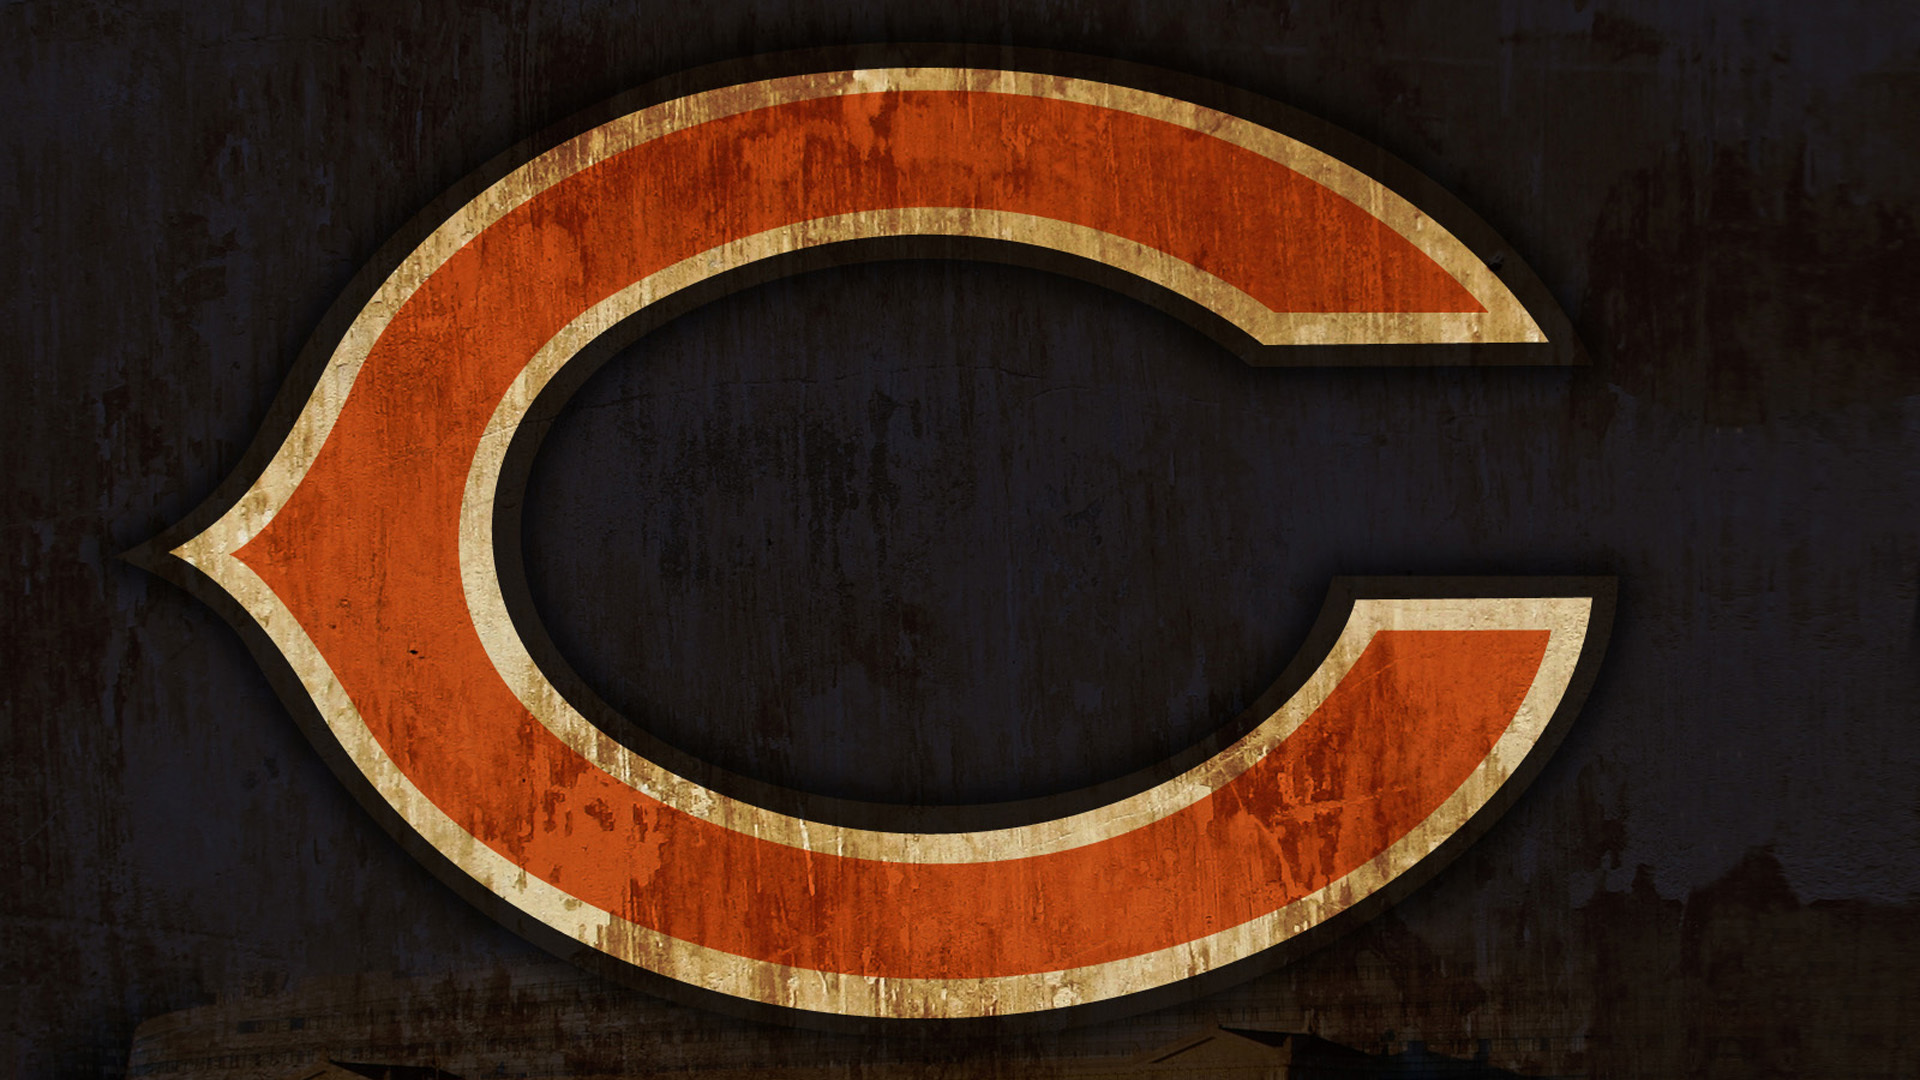 Chicago Bears Wallpaper 45668 1920x1080